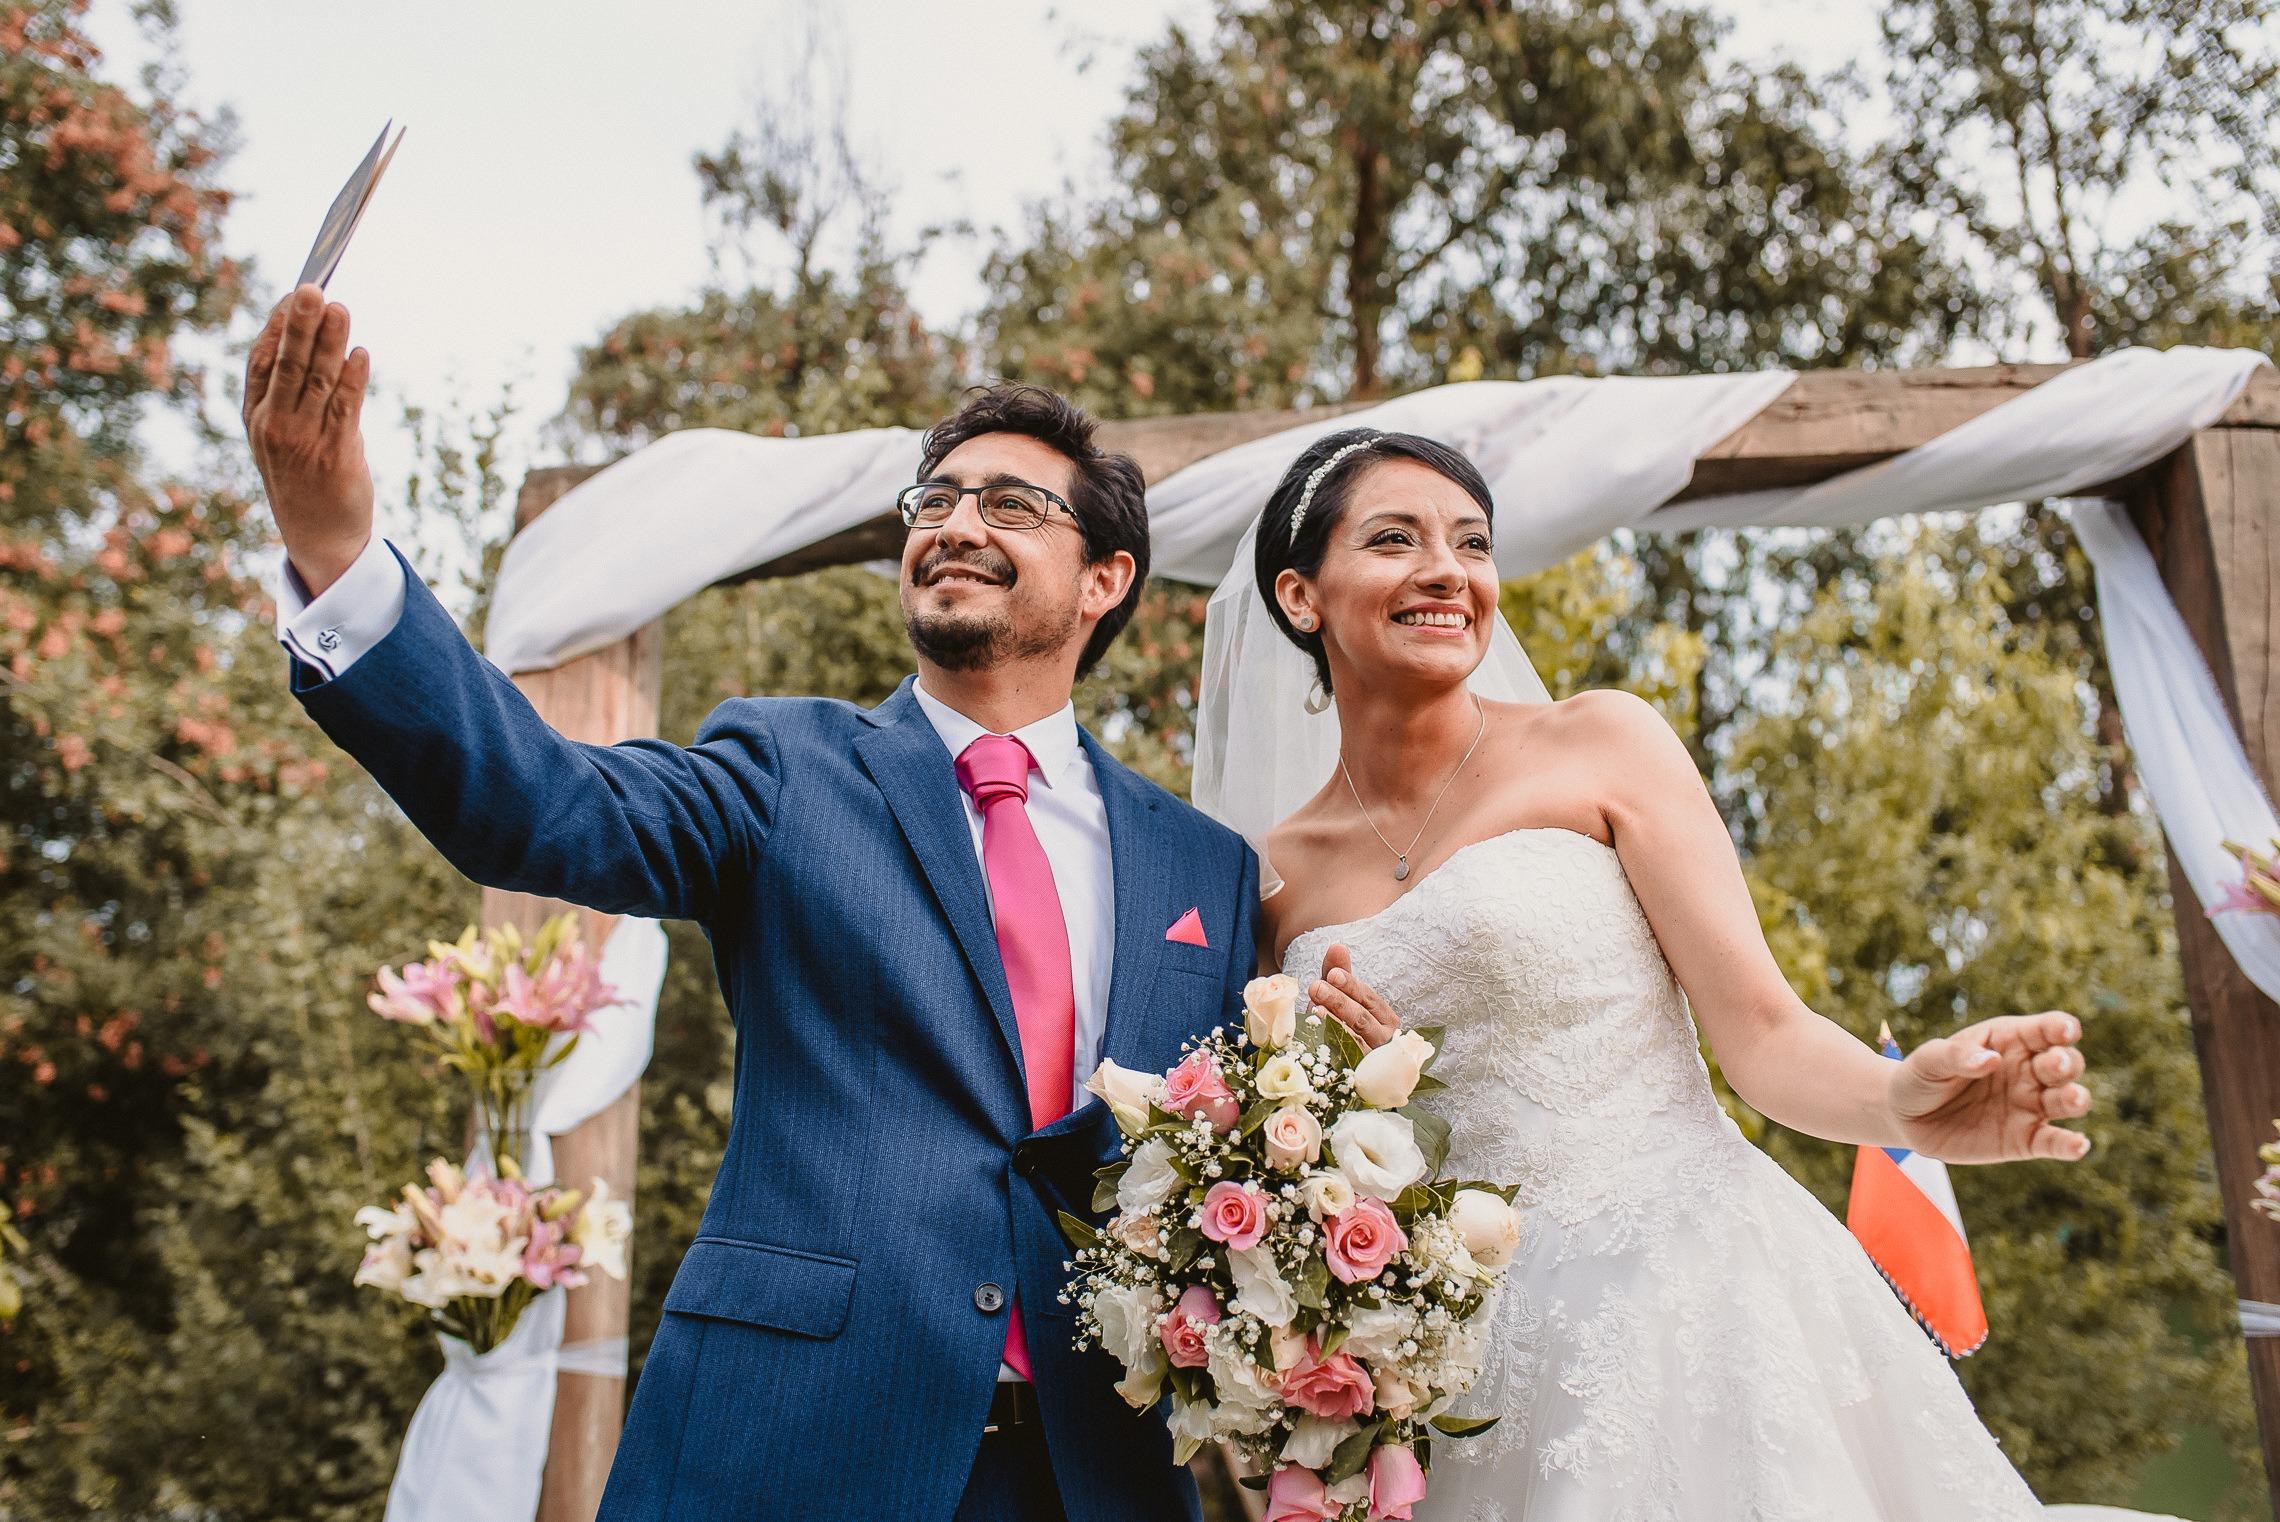 destination-wedding-photographer-chile-argentina-uruguay-fotografo-matrimonio-fotografia-de-bodas-casamiento-deborah-dantzoff-casona-larrain